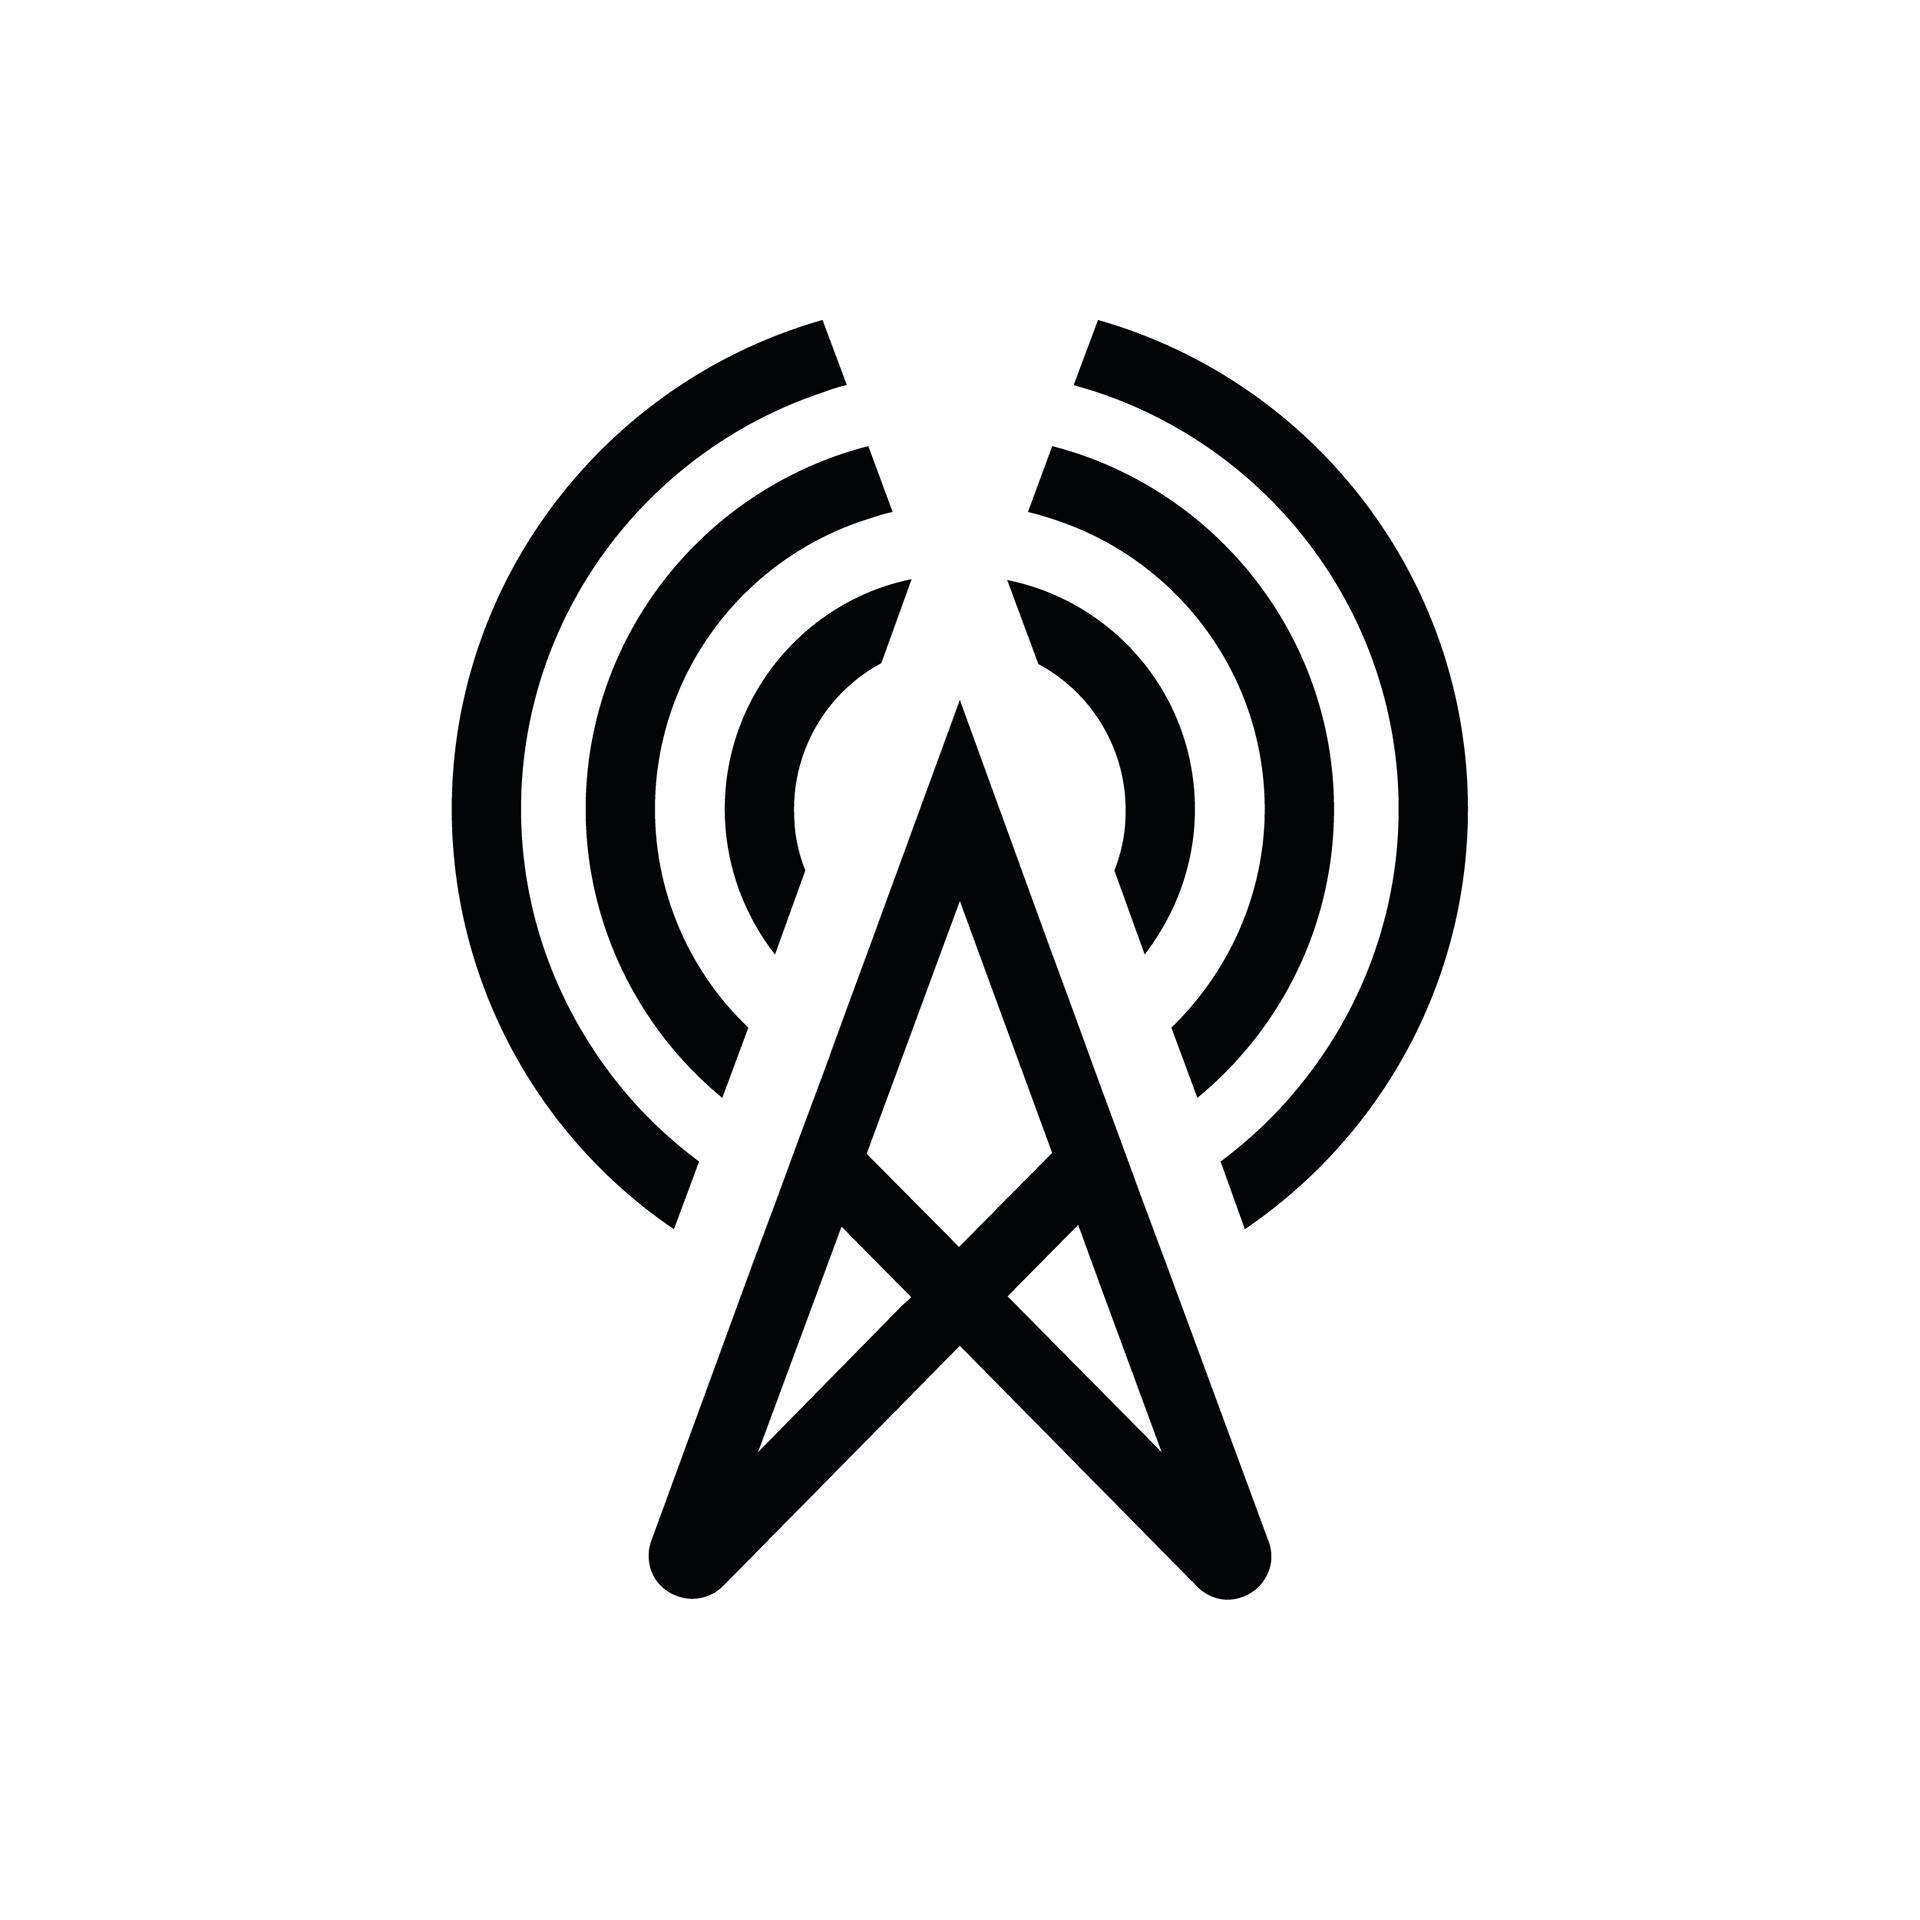 Bosch_Icon_Starter-Kit_Repro_Web_06